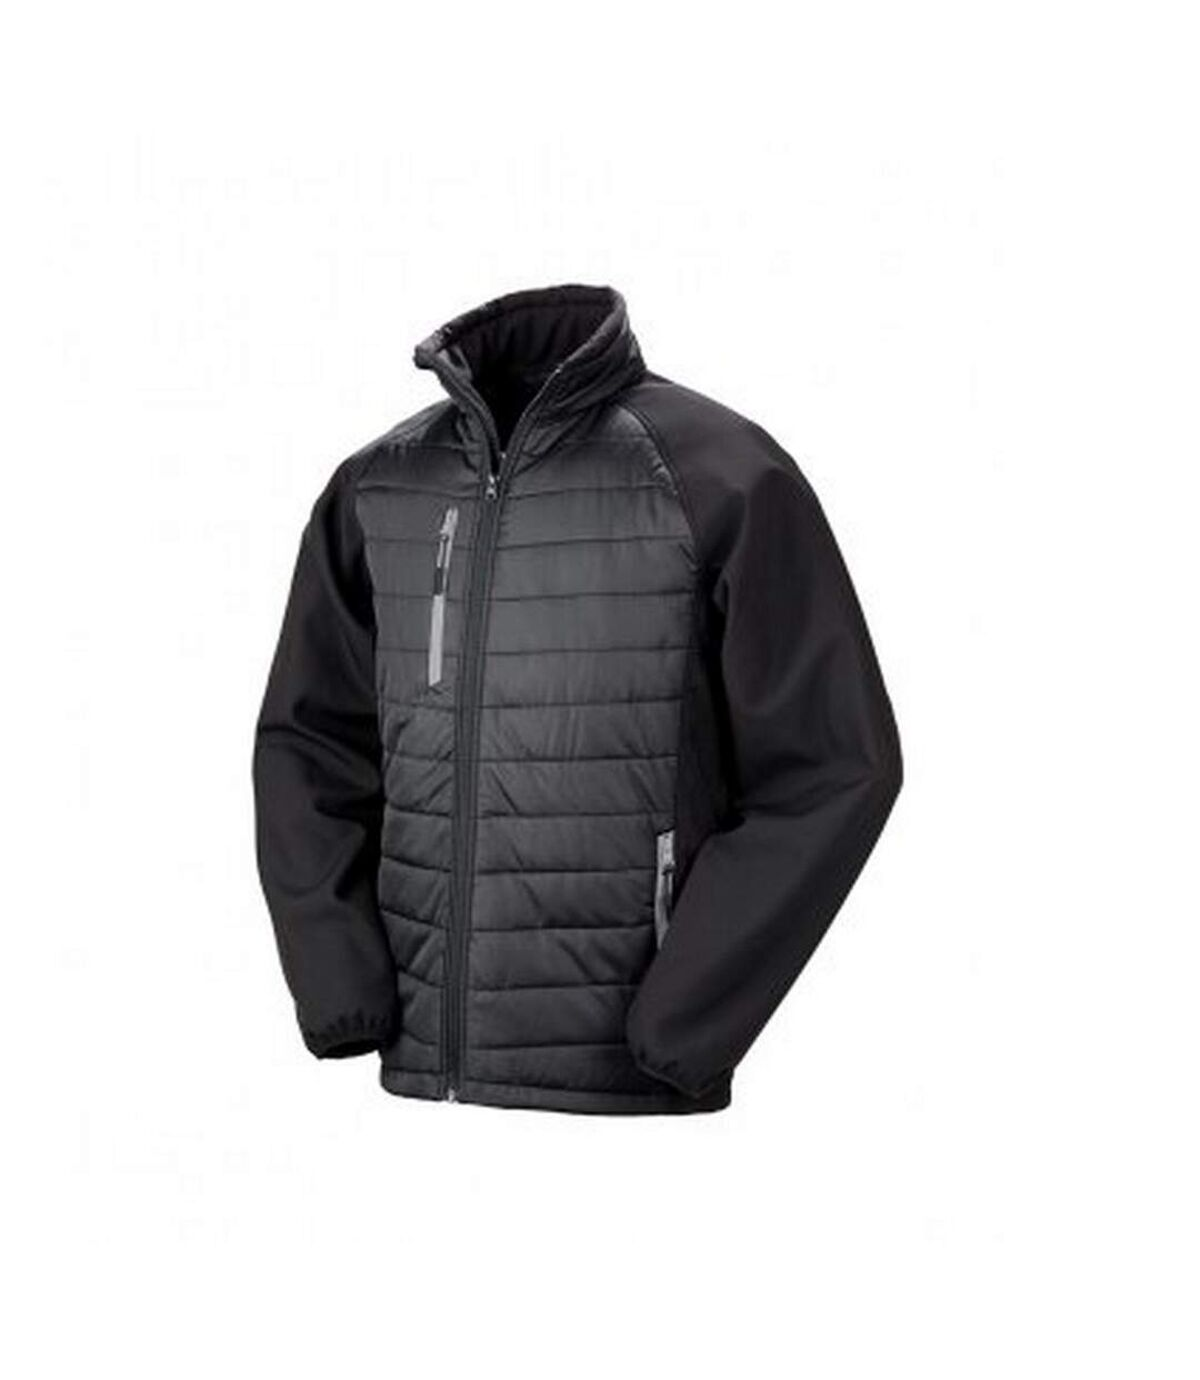 Result Mens Black Compass Padded Soft Shell Jacket (Black/Grey) - UTPC3326